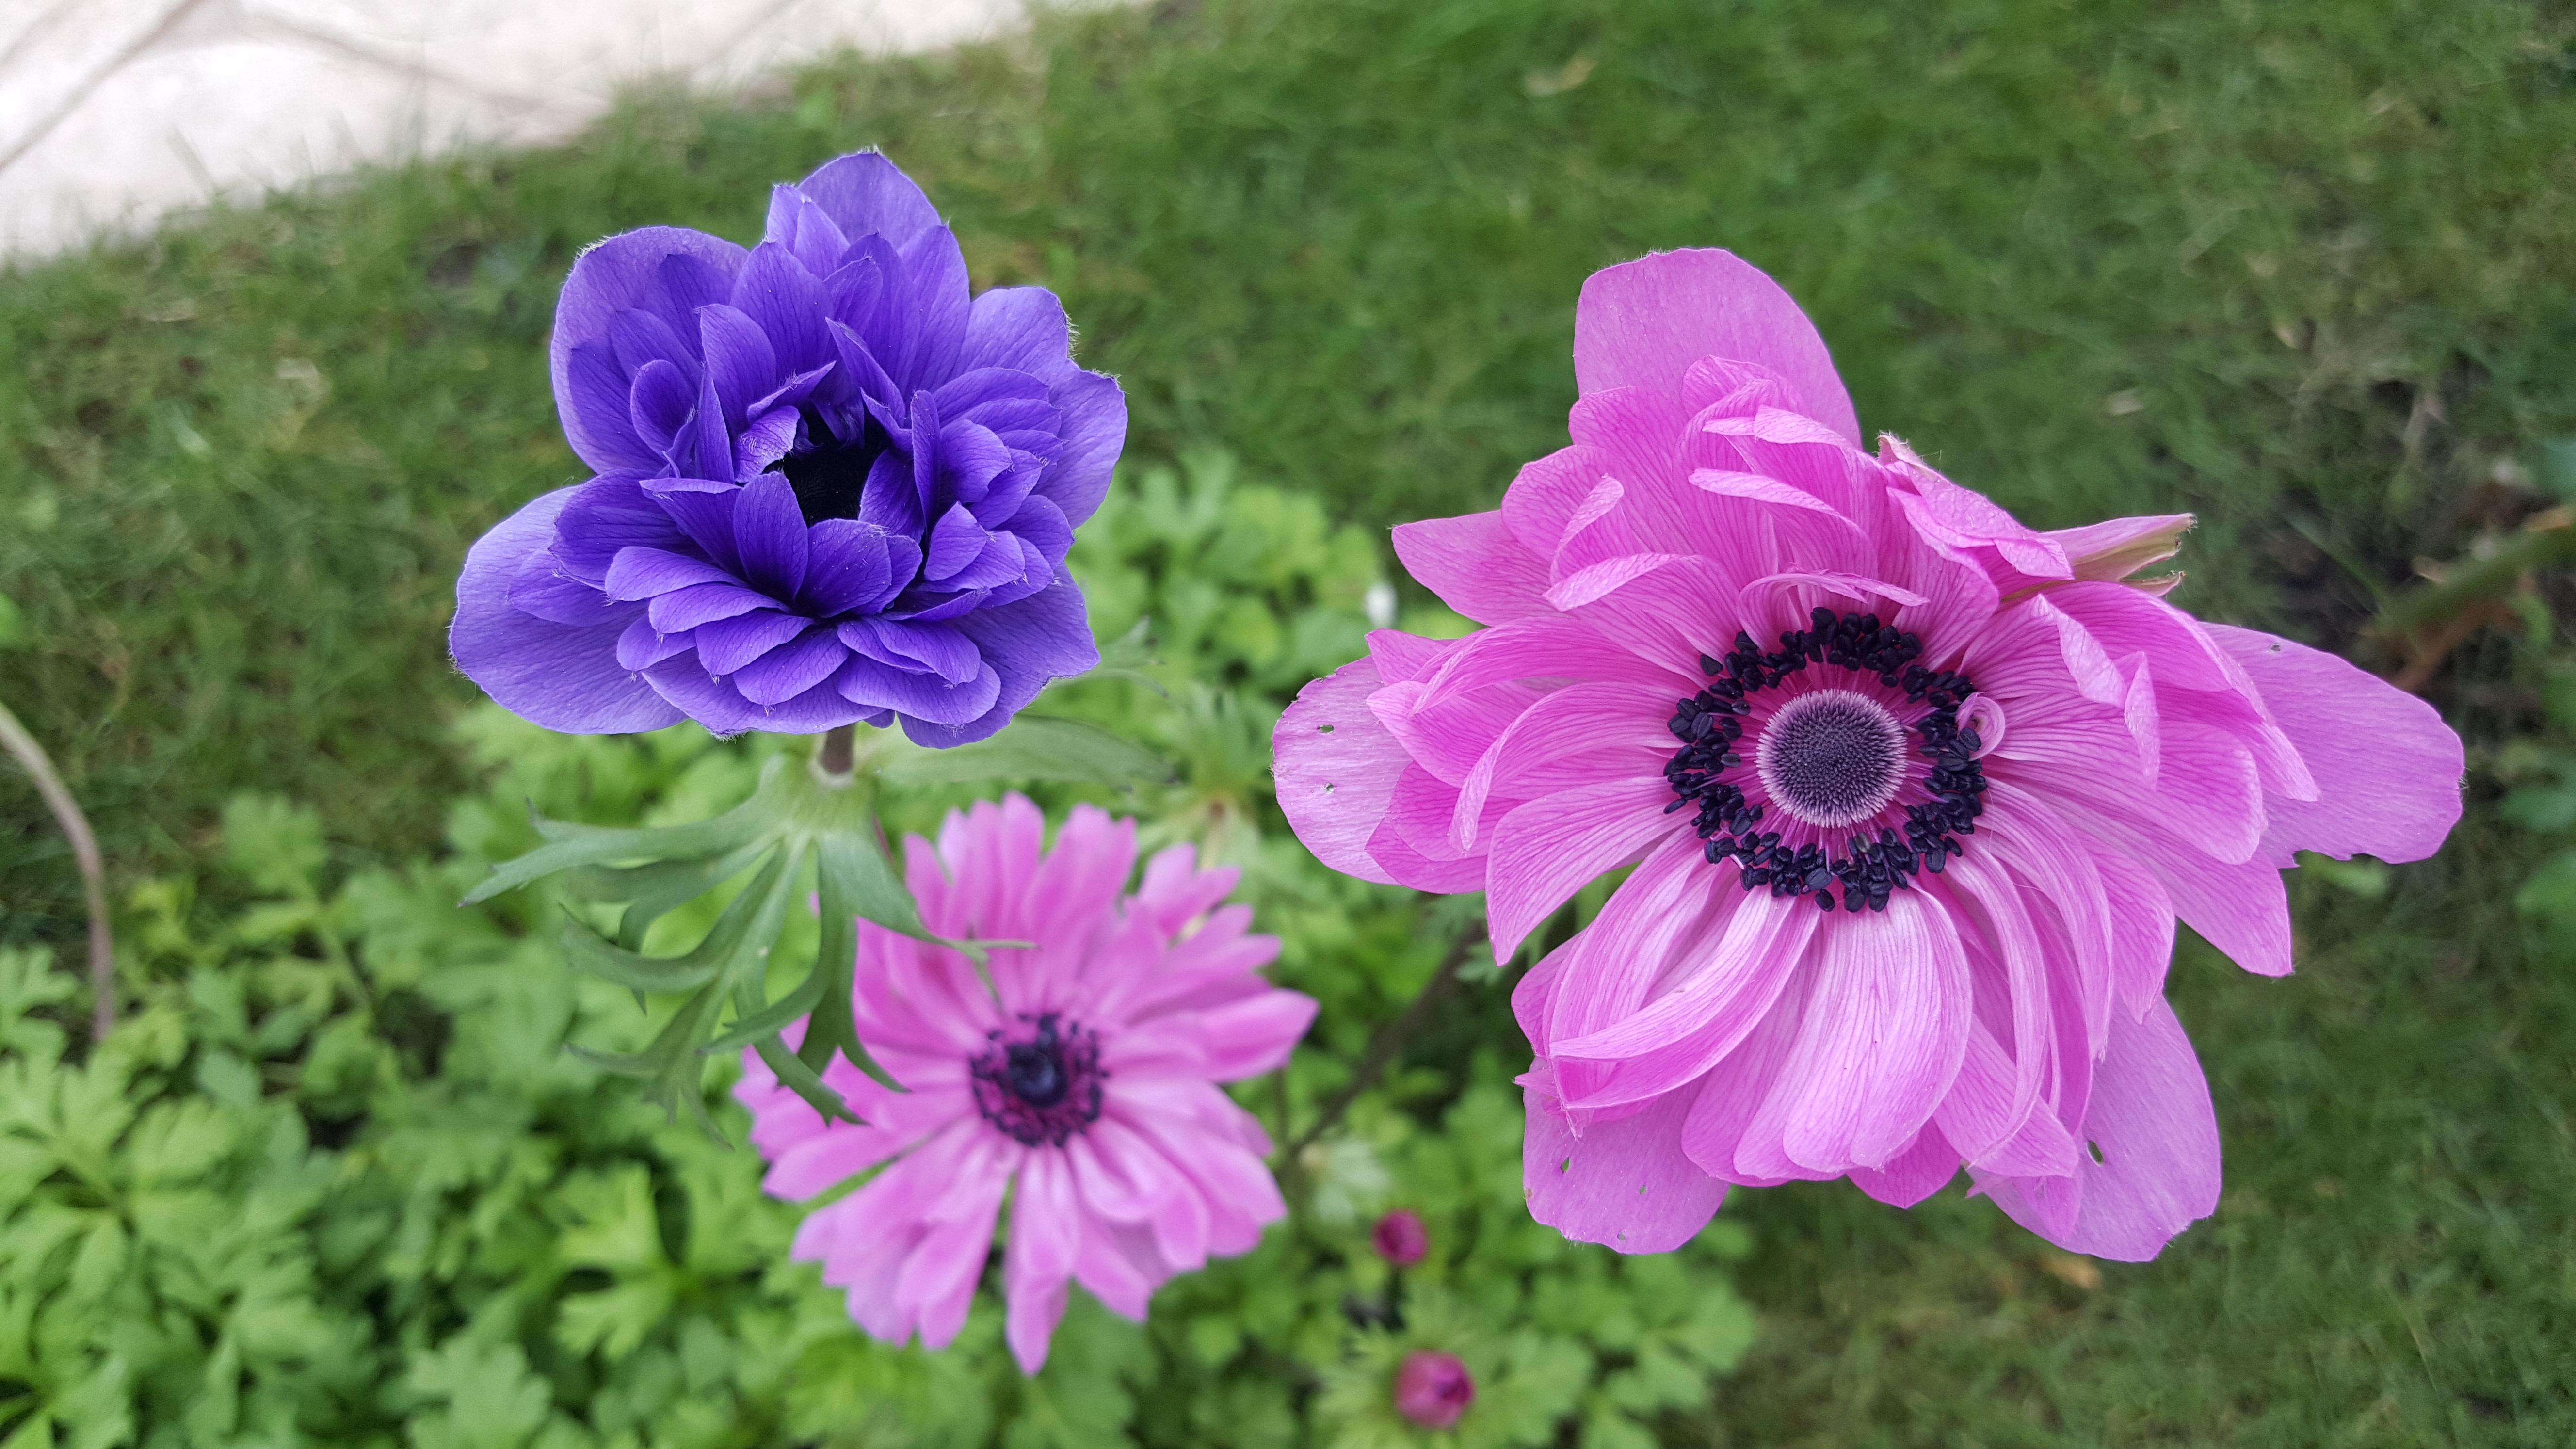 violet colour flower images download